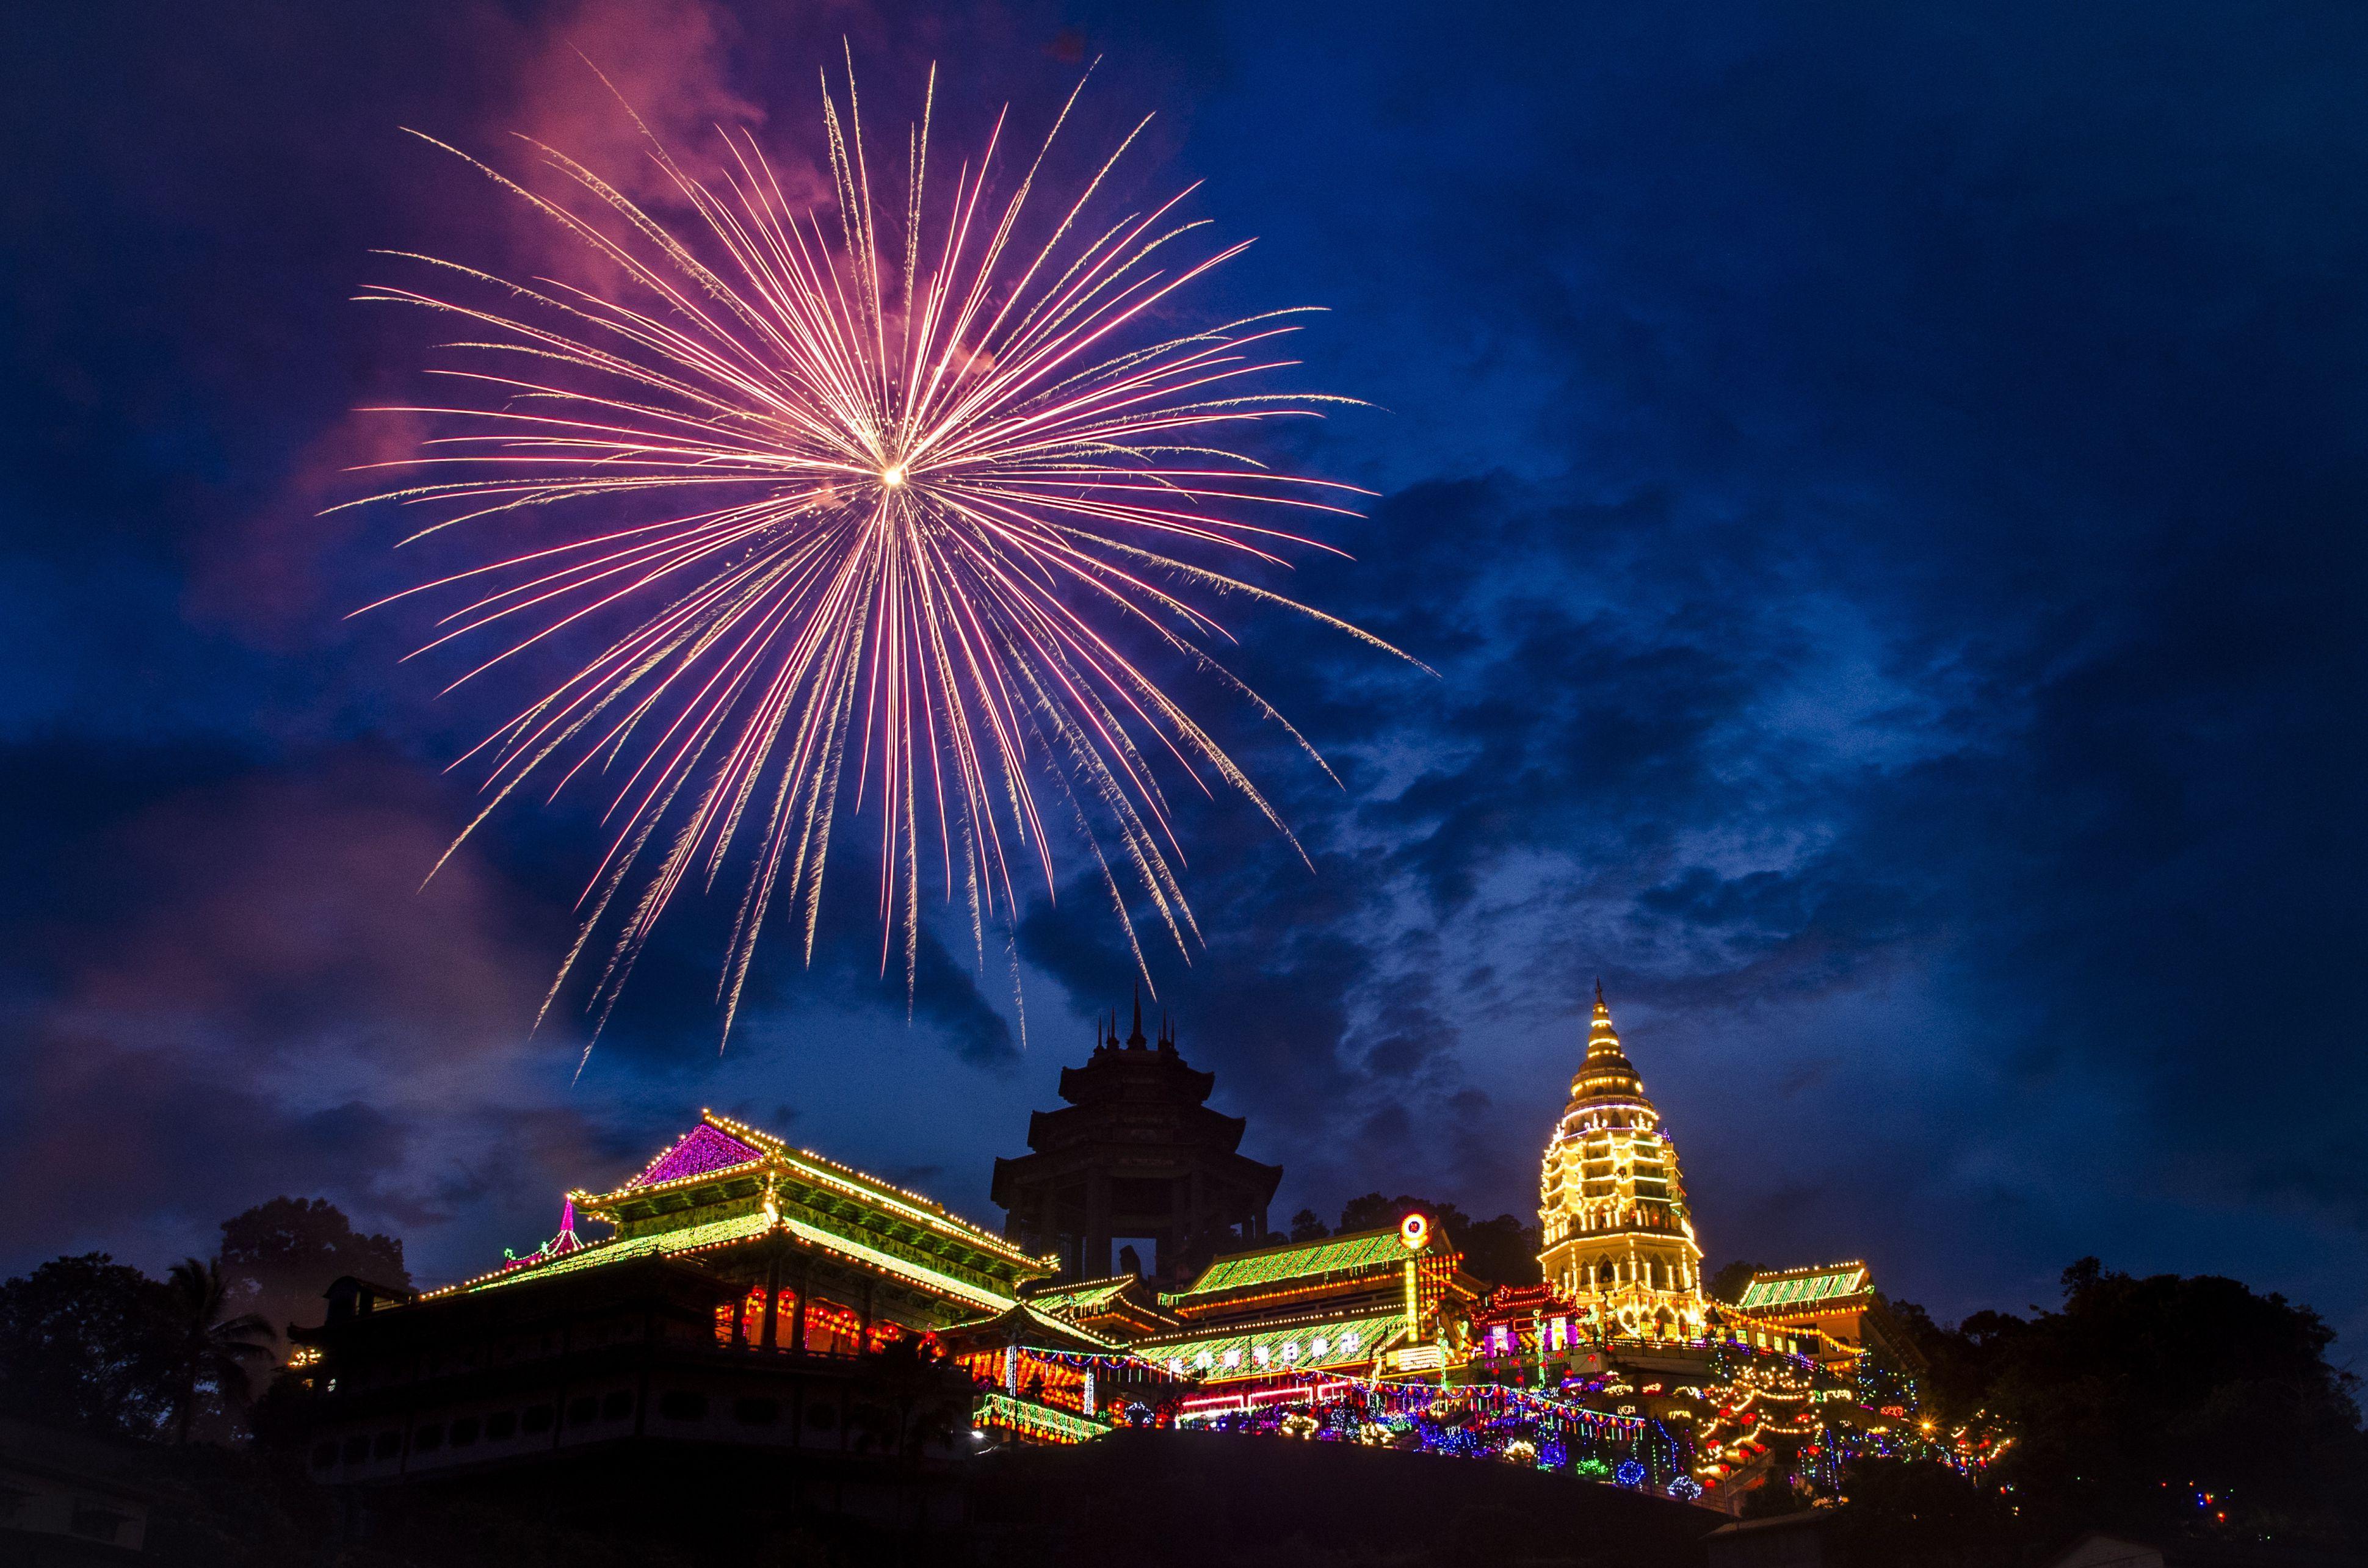 Fireworks celebrating Chinese New Year at Kek Lok Si Temple, Penang, Malaysia